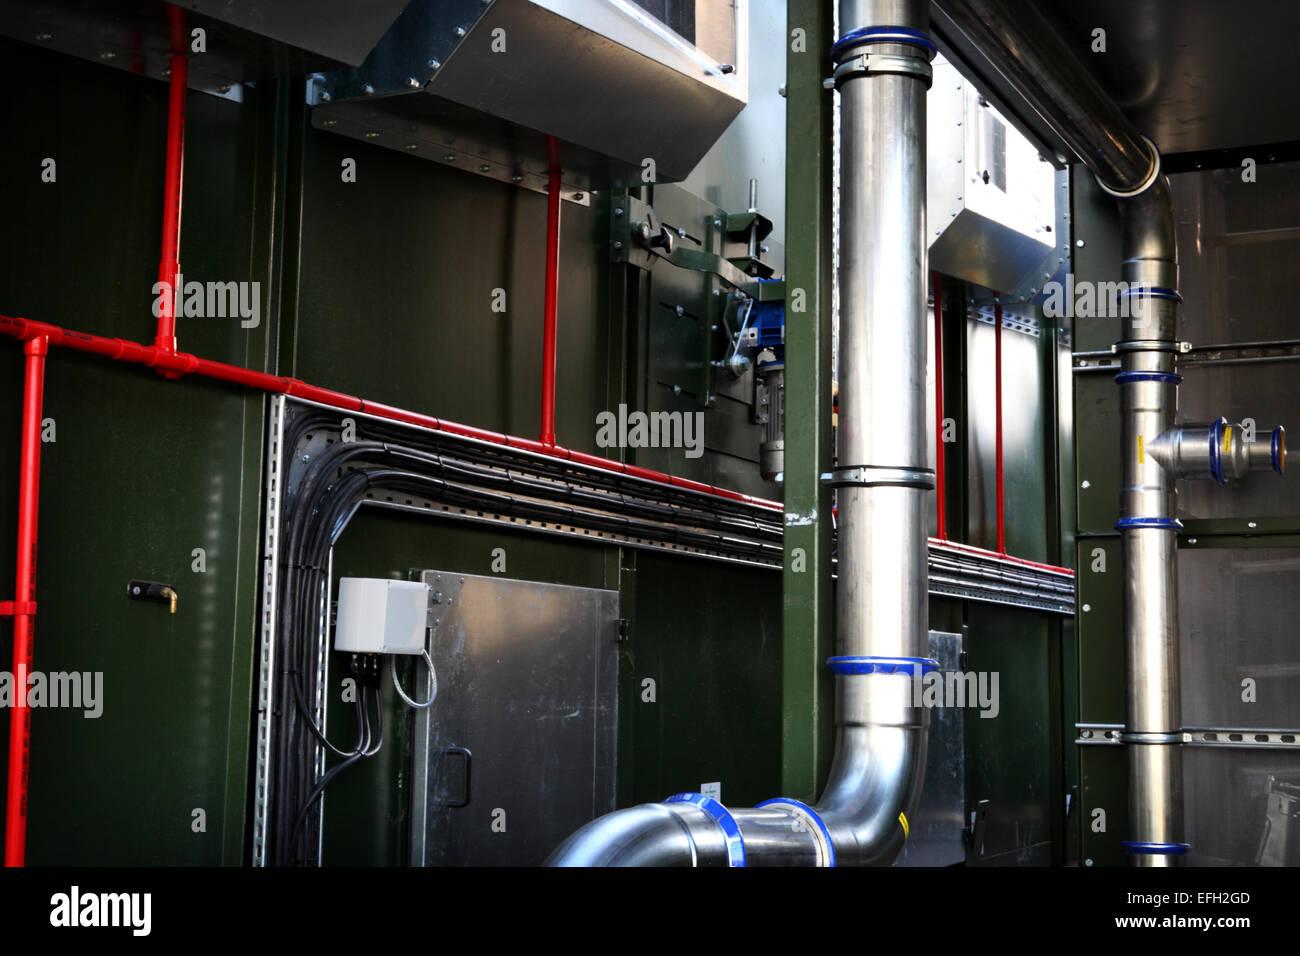 Industrial Boiler Room Stockfotos & Industrial Boiler Room Bilder ...